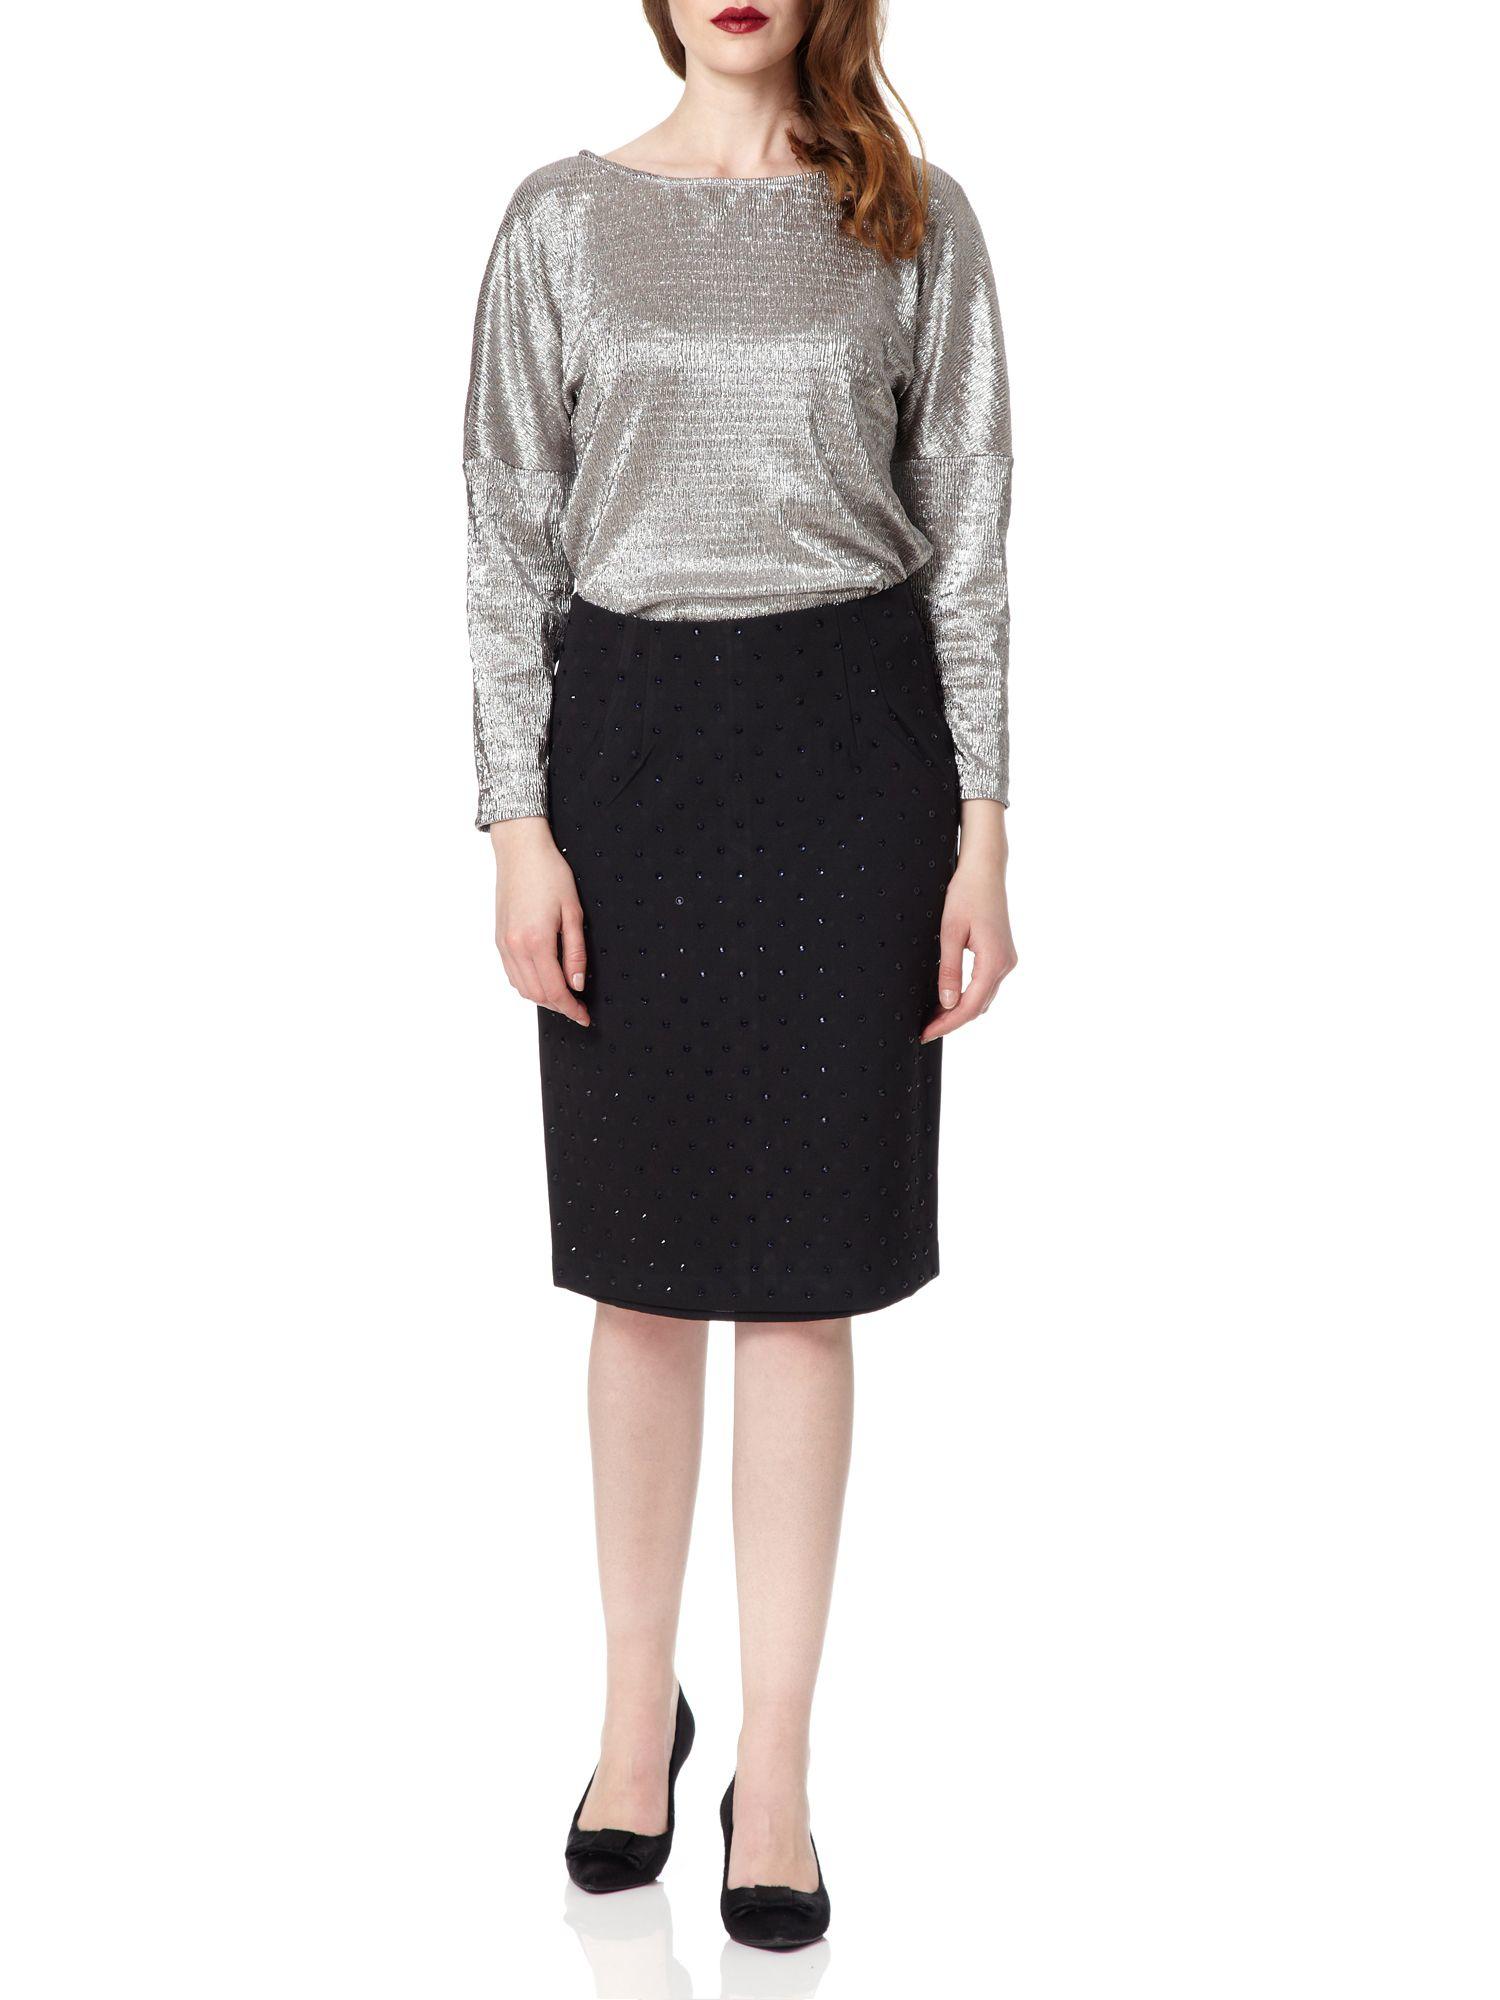 Almost famous metallic foil top in metallic lyst for Silver metallic shirt women s